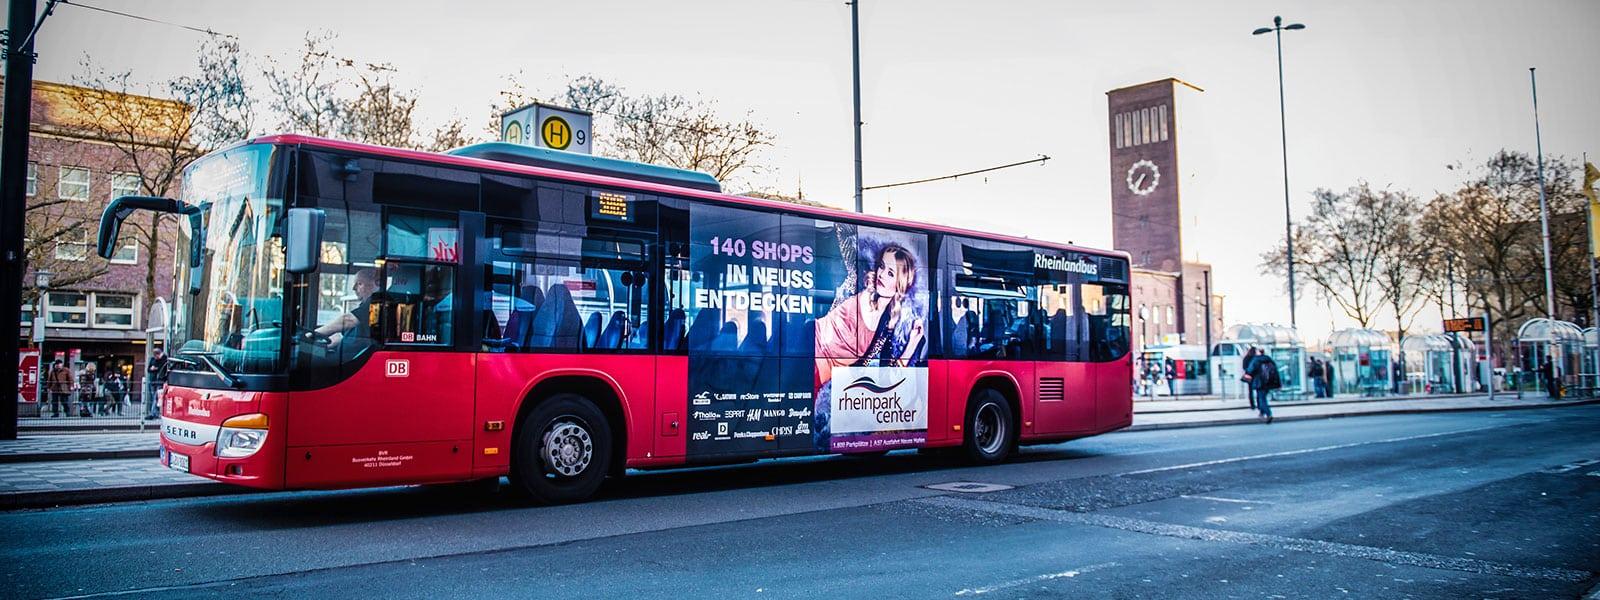 Duesseldorf-Verkehrsmittelwerbung-Bus-Traffic-Board